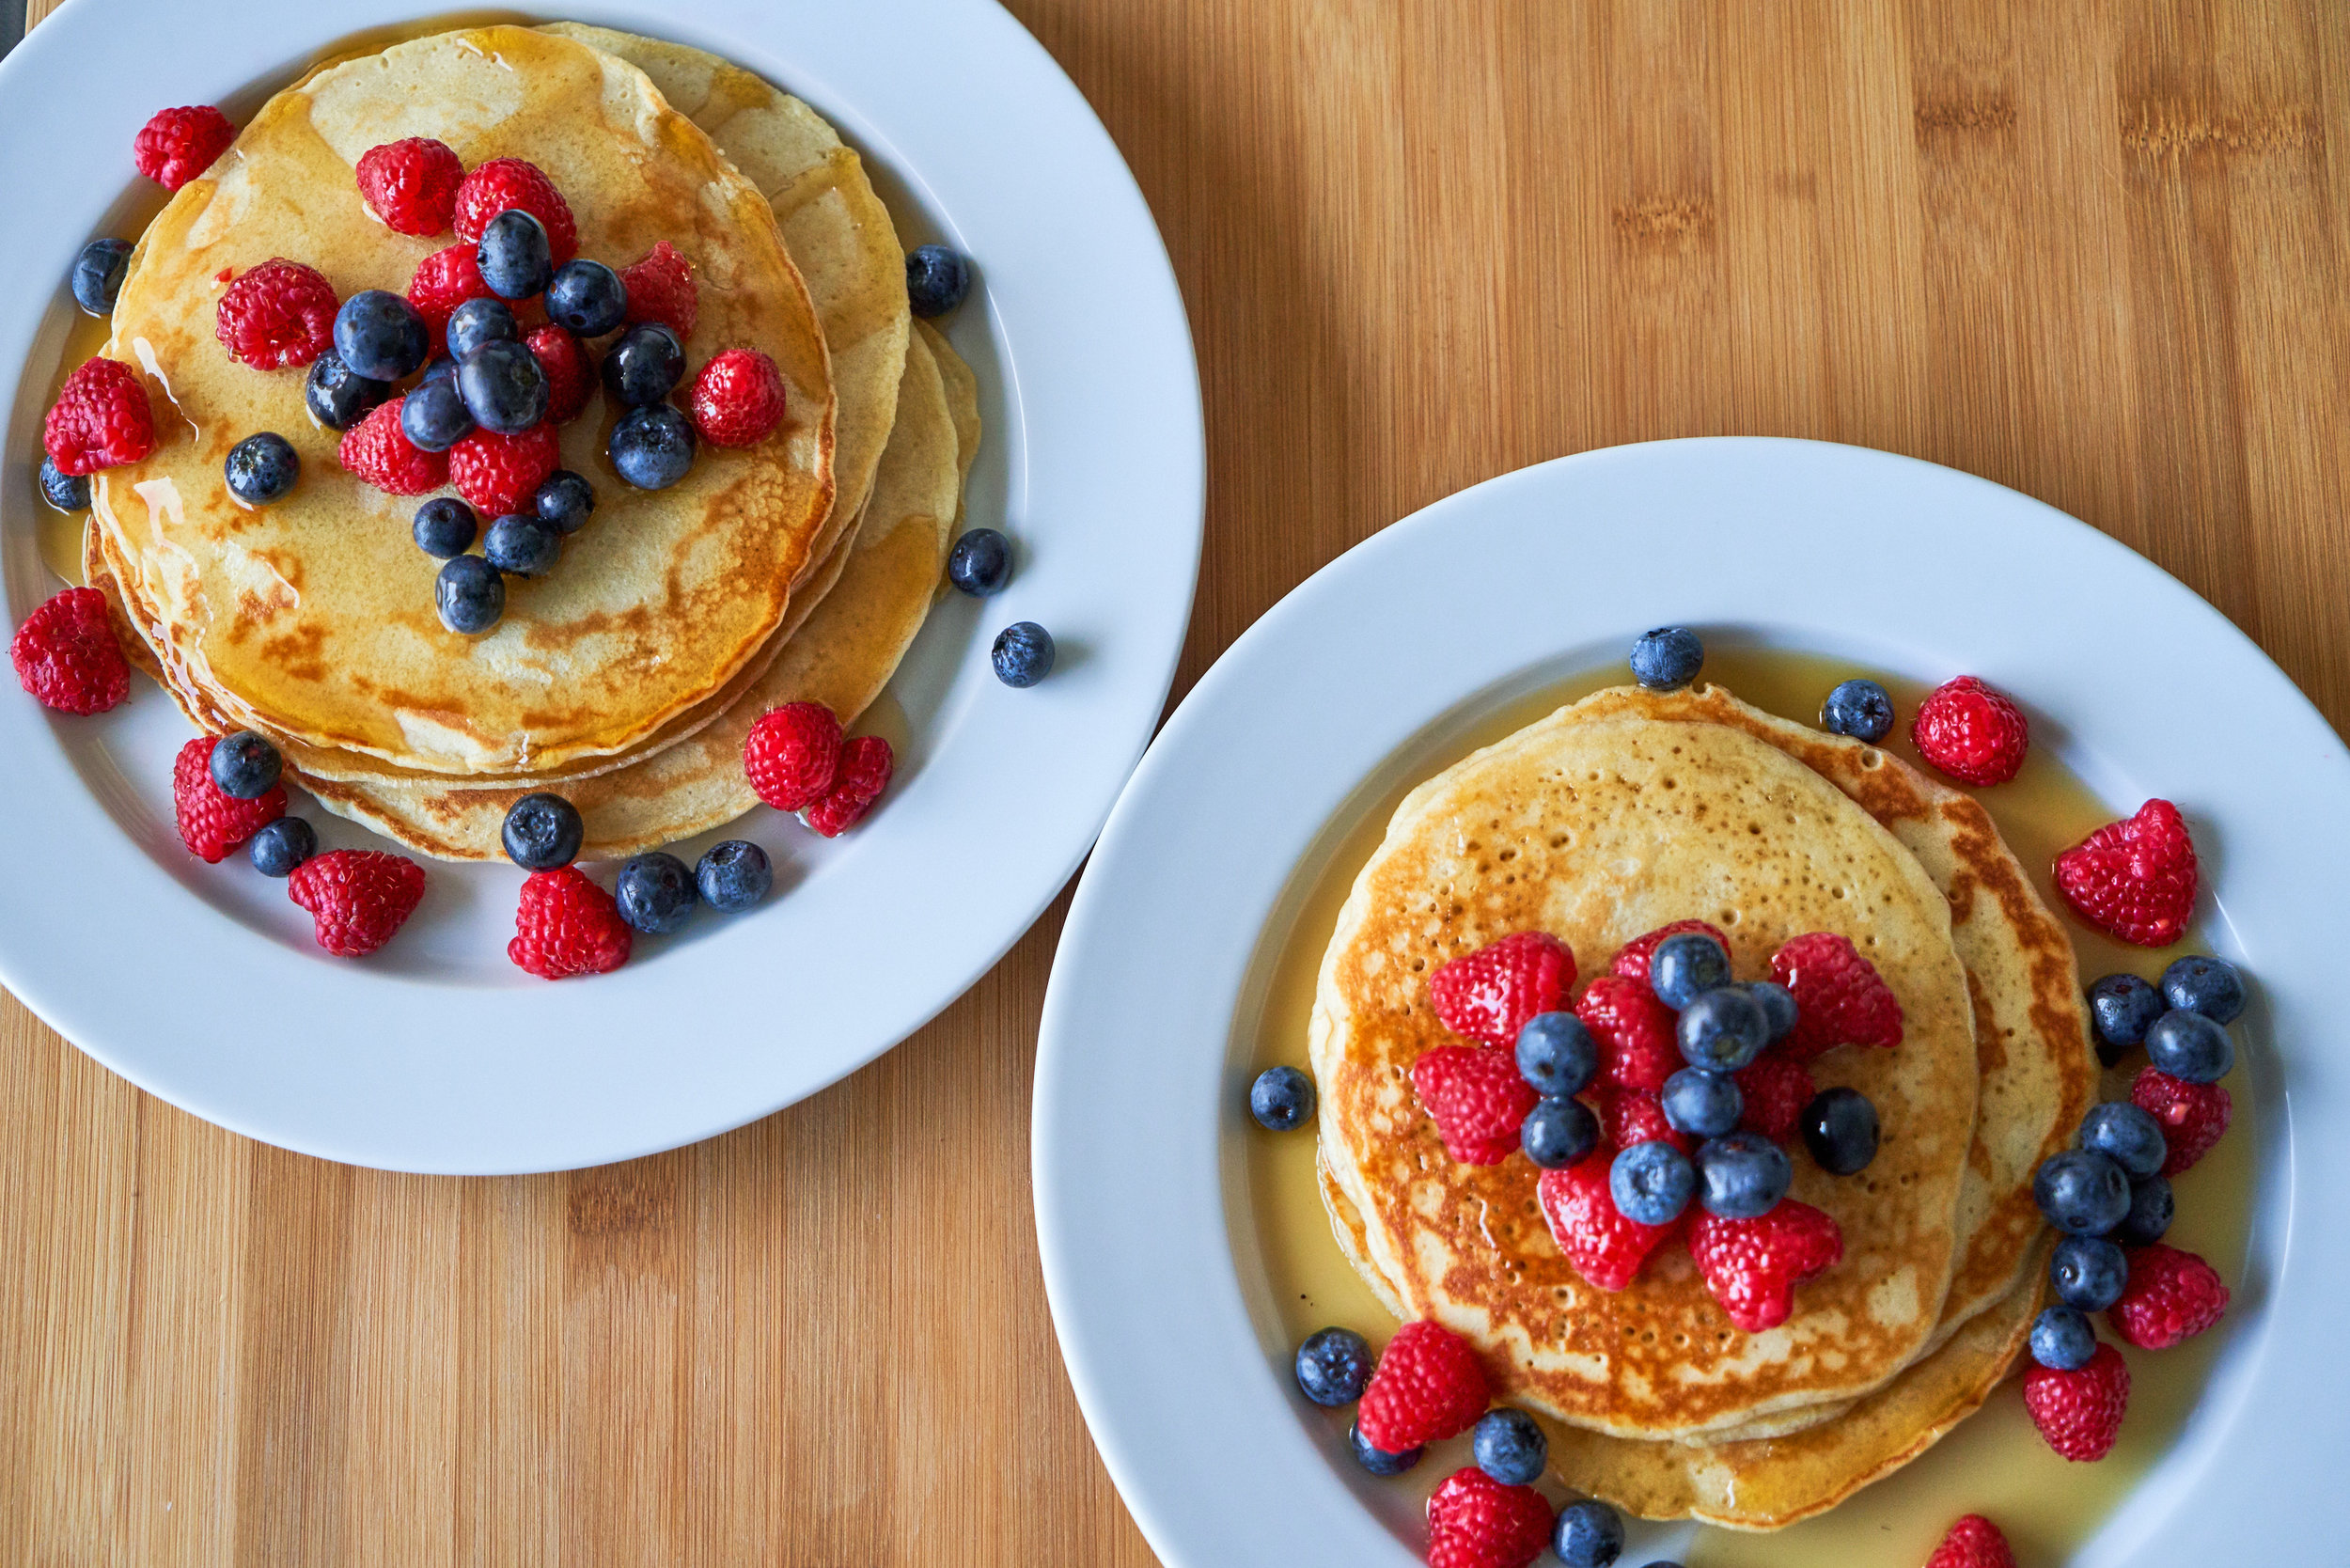 Sourdough Pancakes/Waffles   What To Do With Discard Sourdough - bon appetit!   In Carina's Kitchen